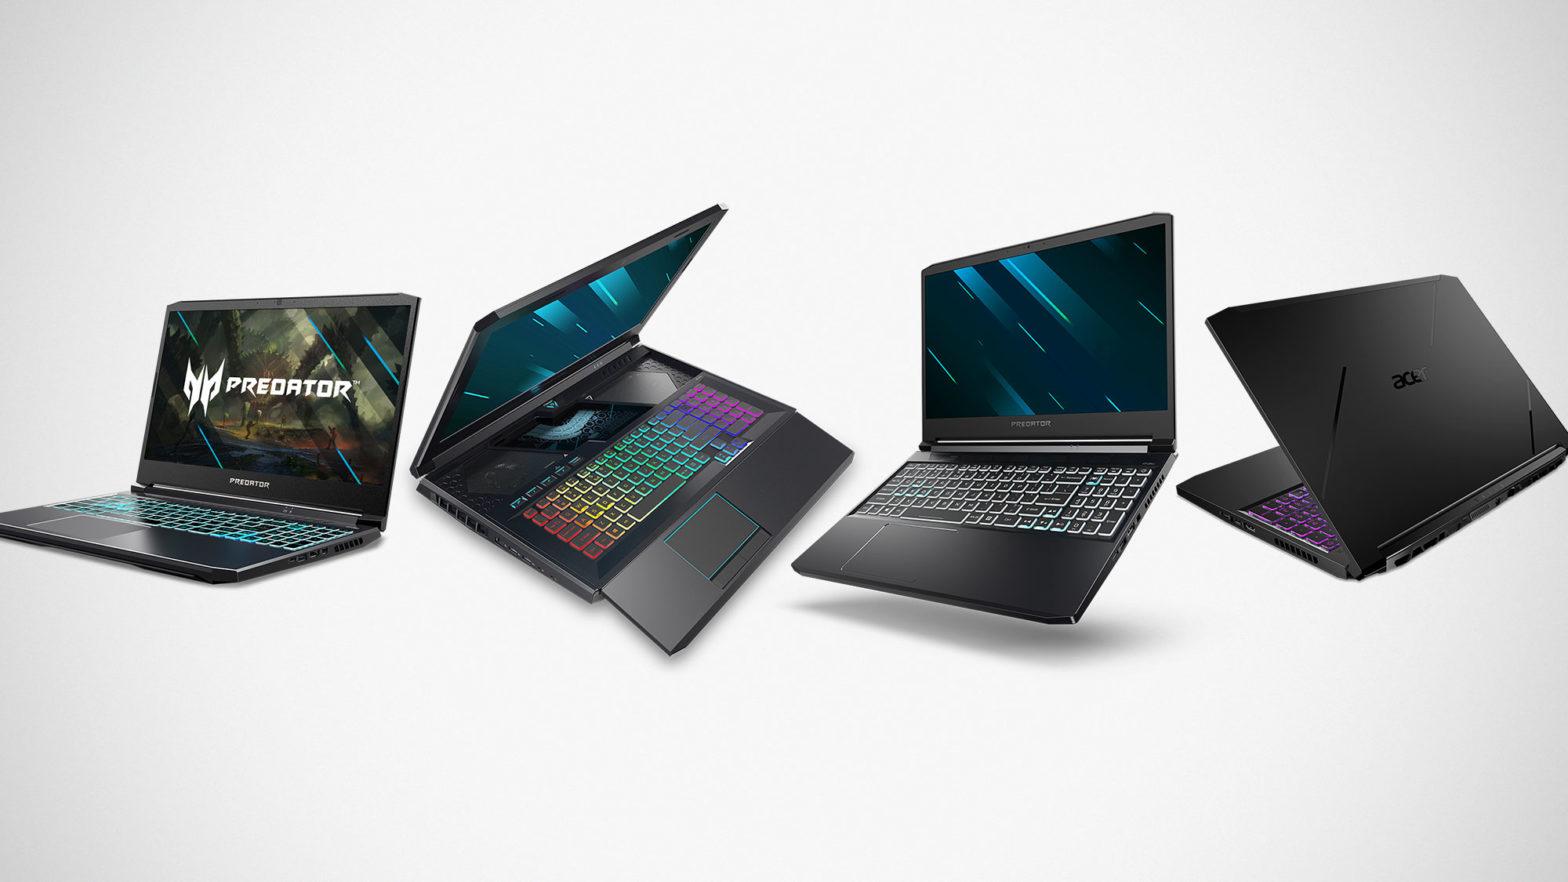 2020 Acer Predator Helios, Predator Triton and Nitro